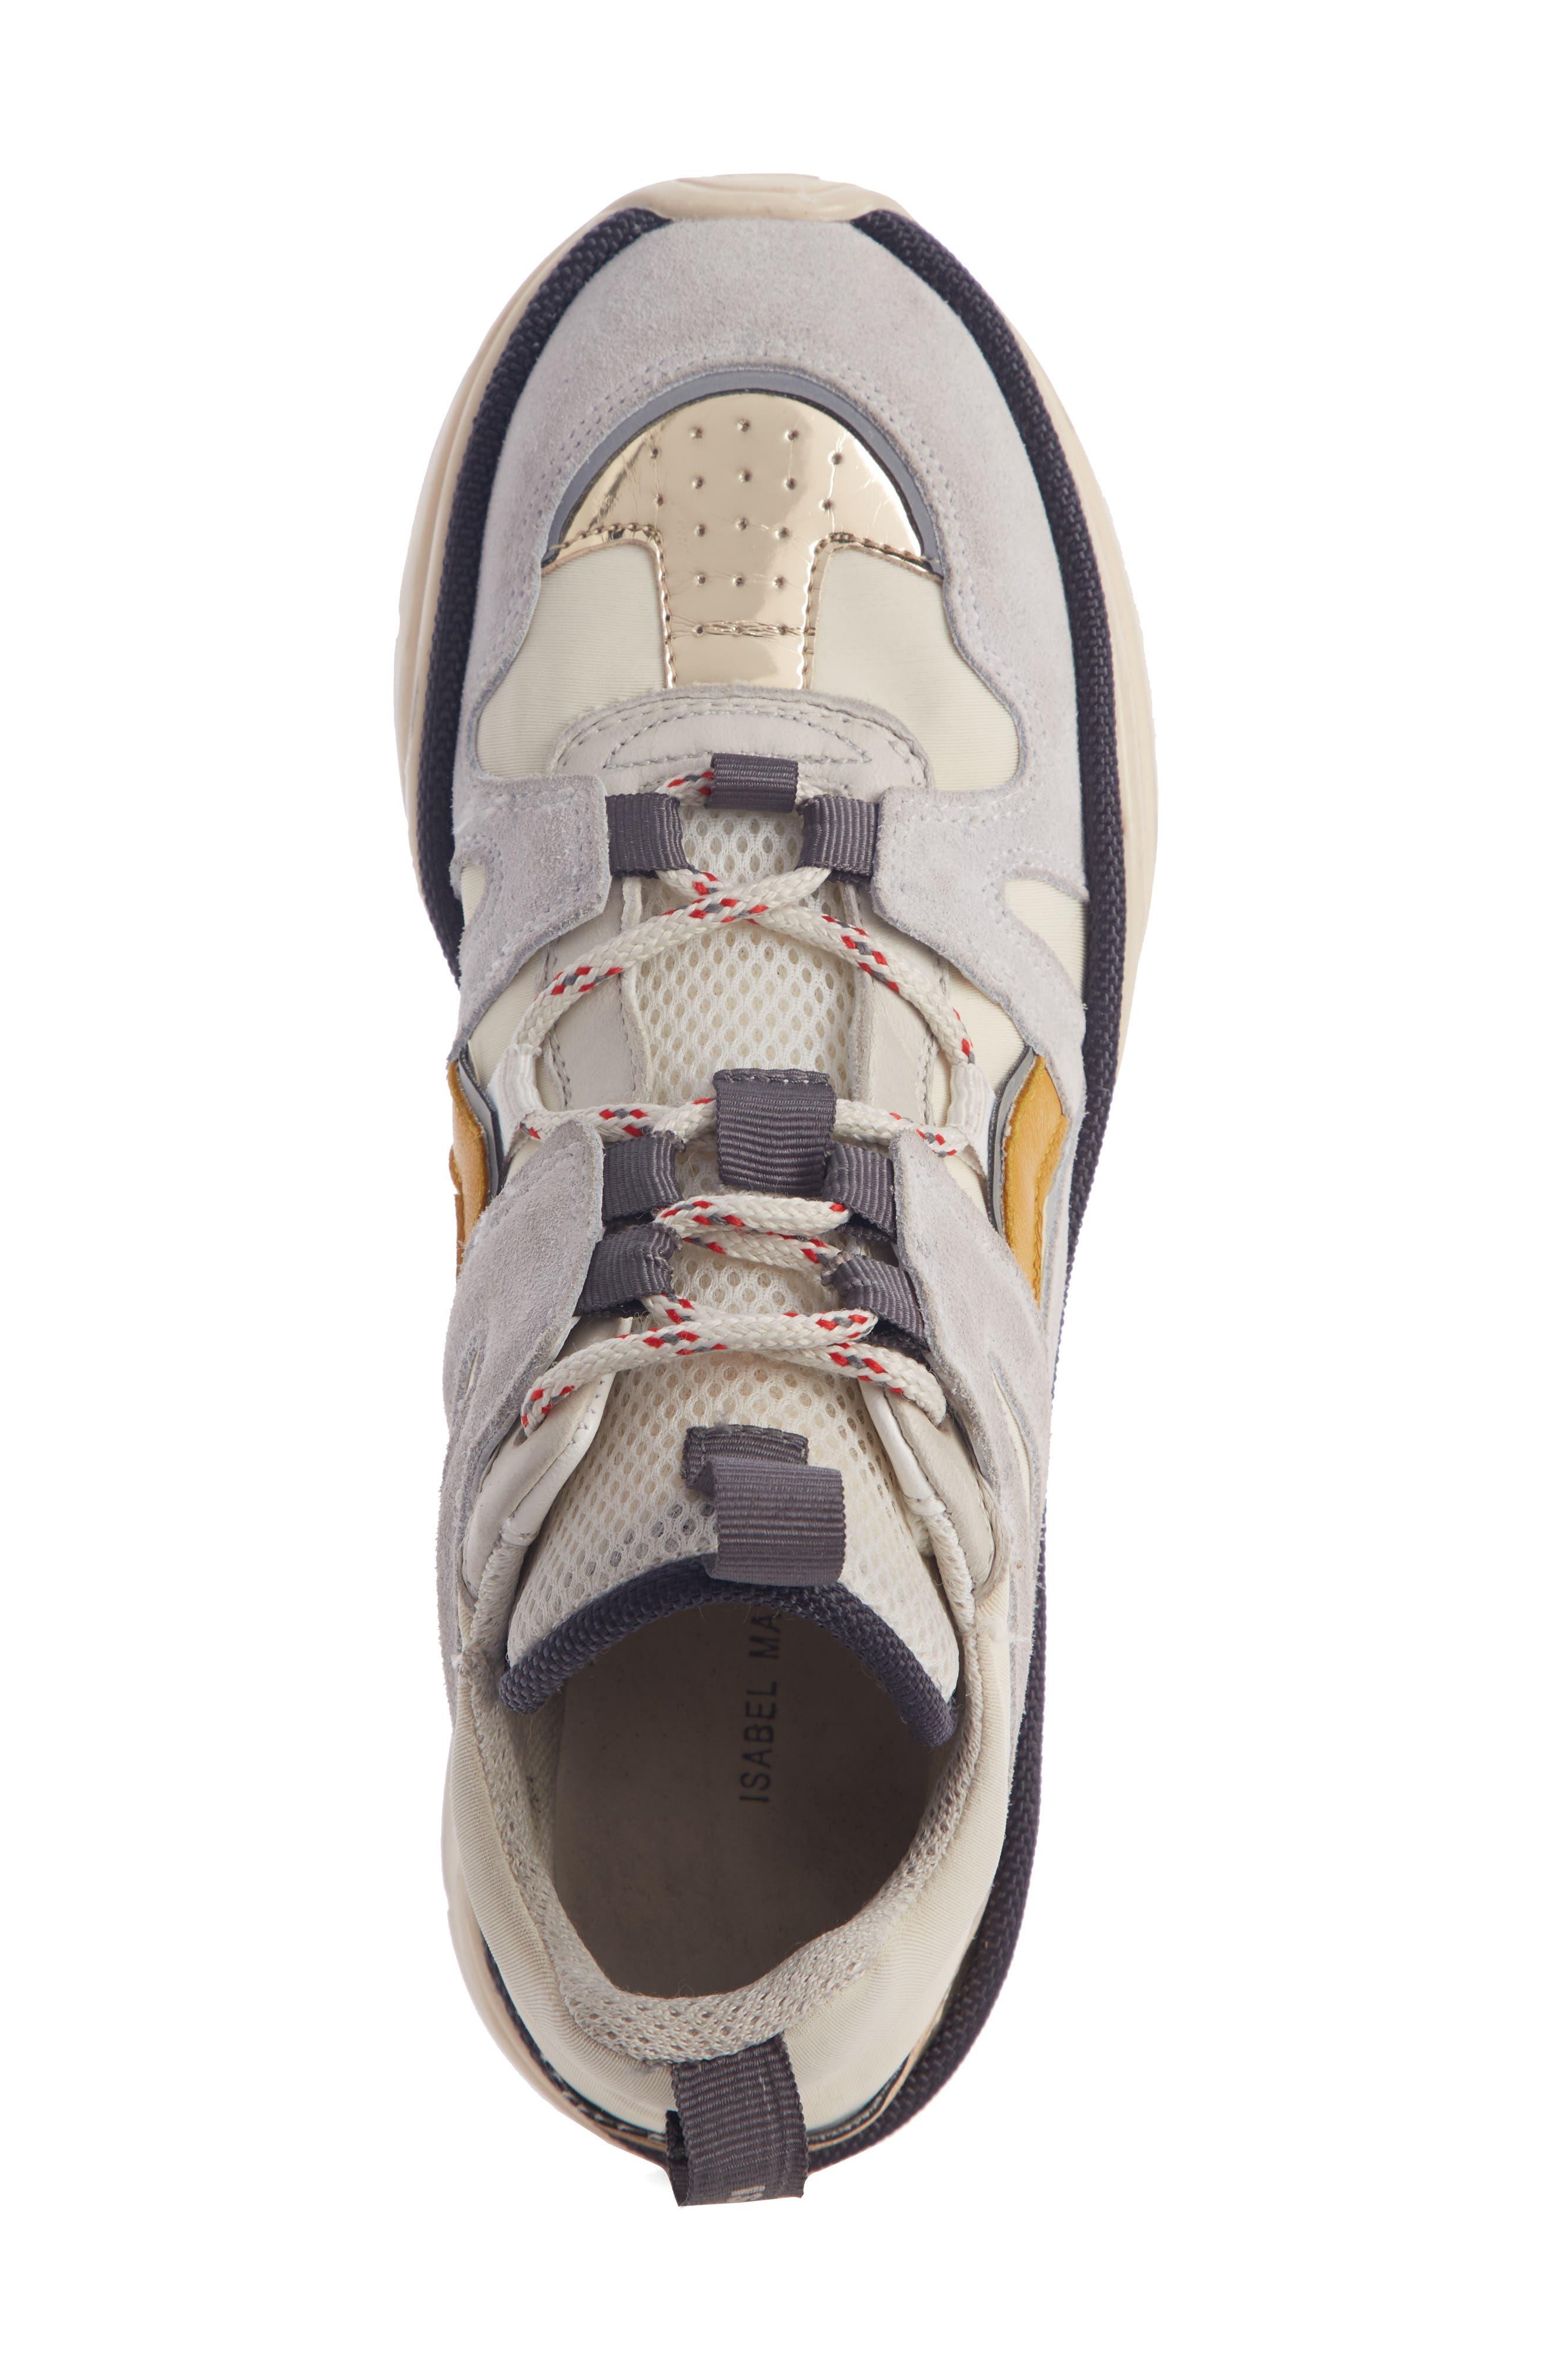 Kindsay Lace-Up Sneaker,                             Alternate thumbnail 4, color,                             WHITE